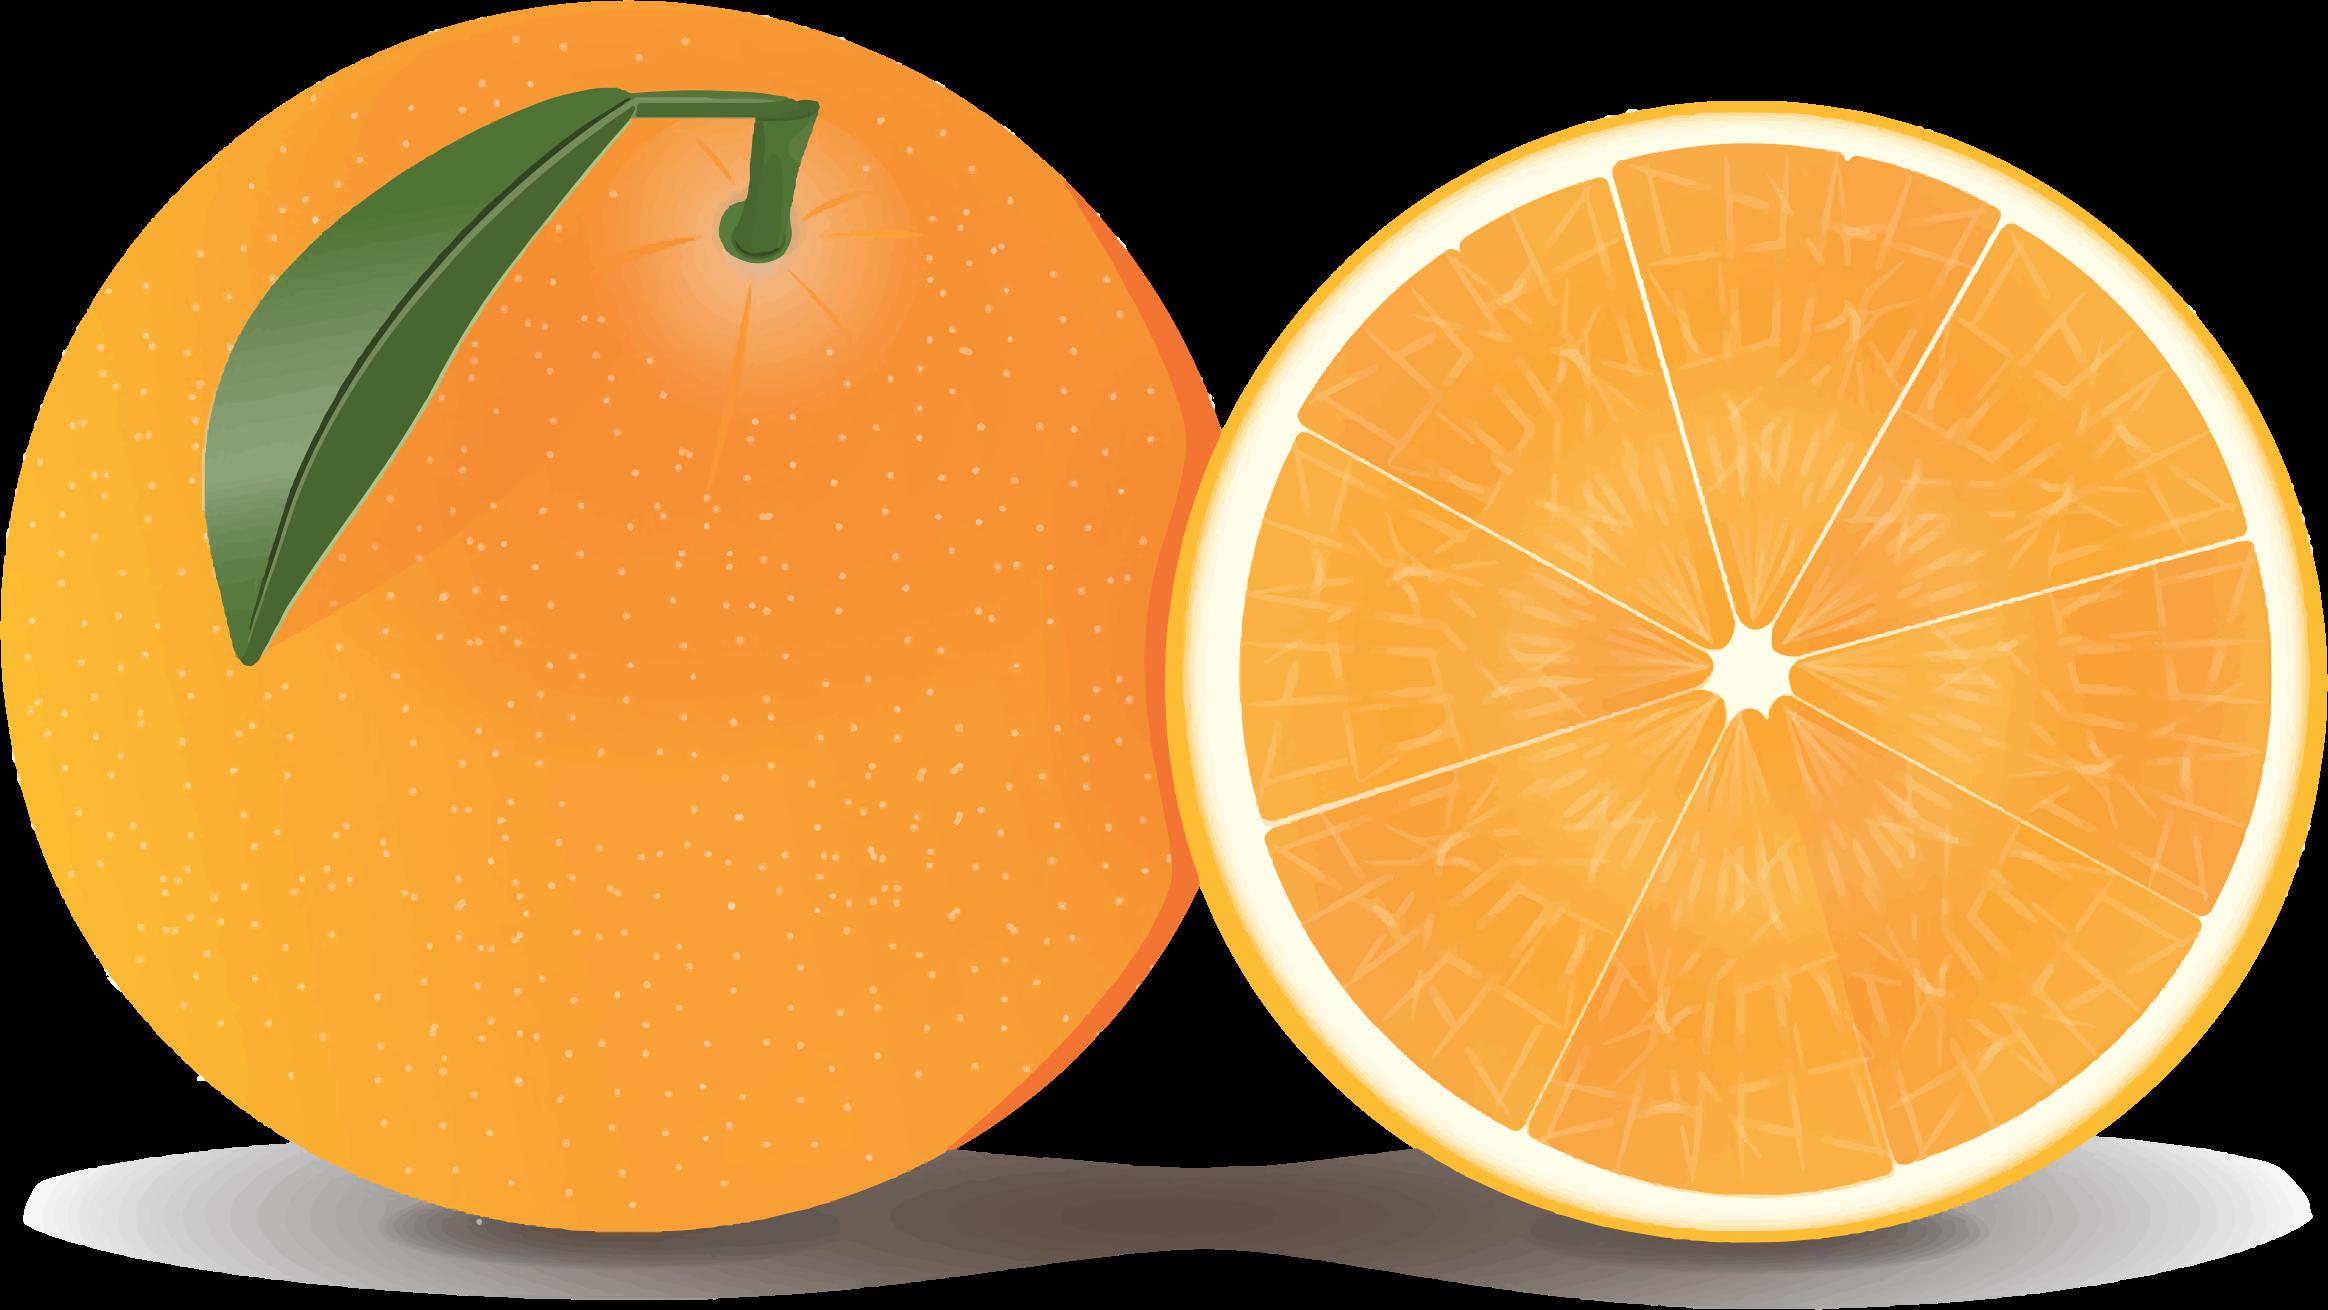 Png mart. Picture clipart orange